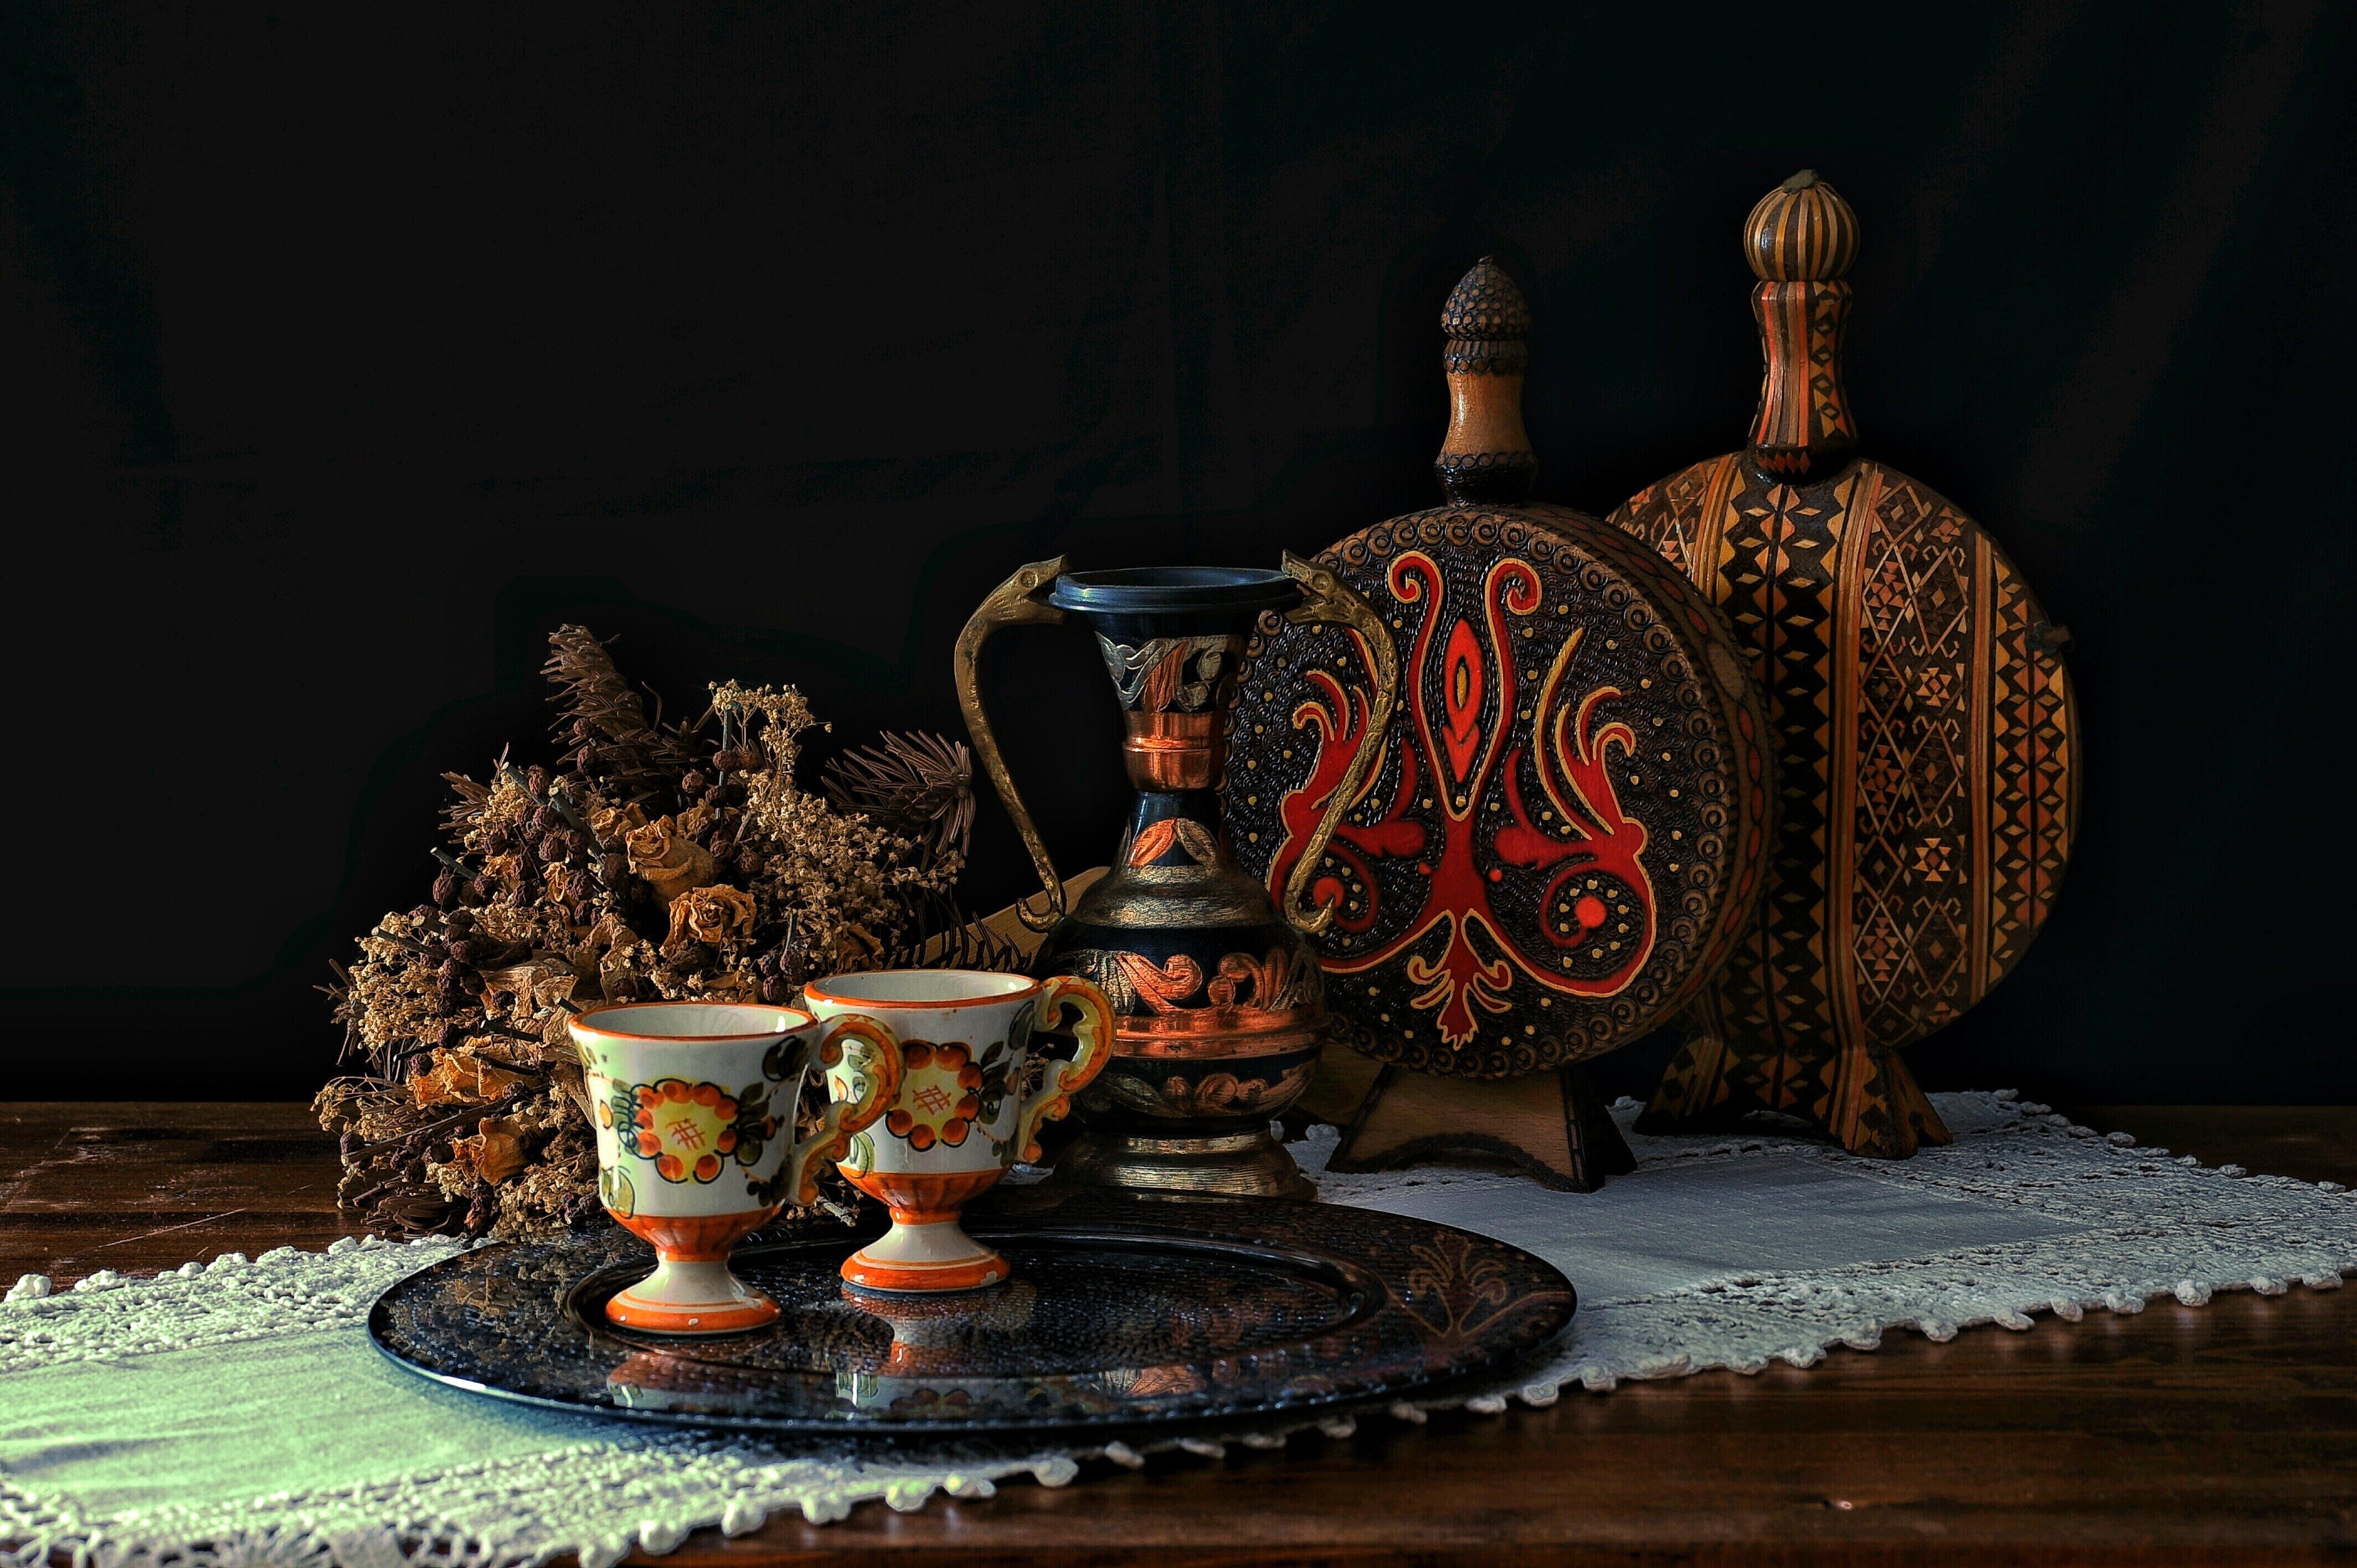 Two White Teacups on Black Tray